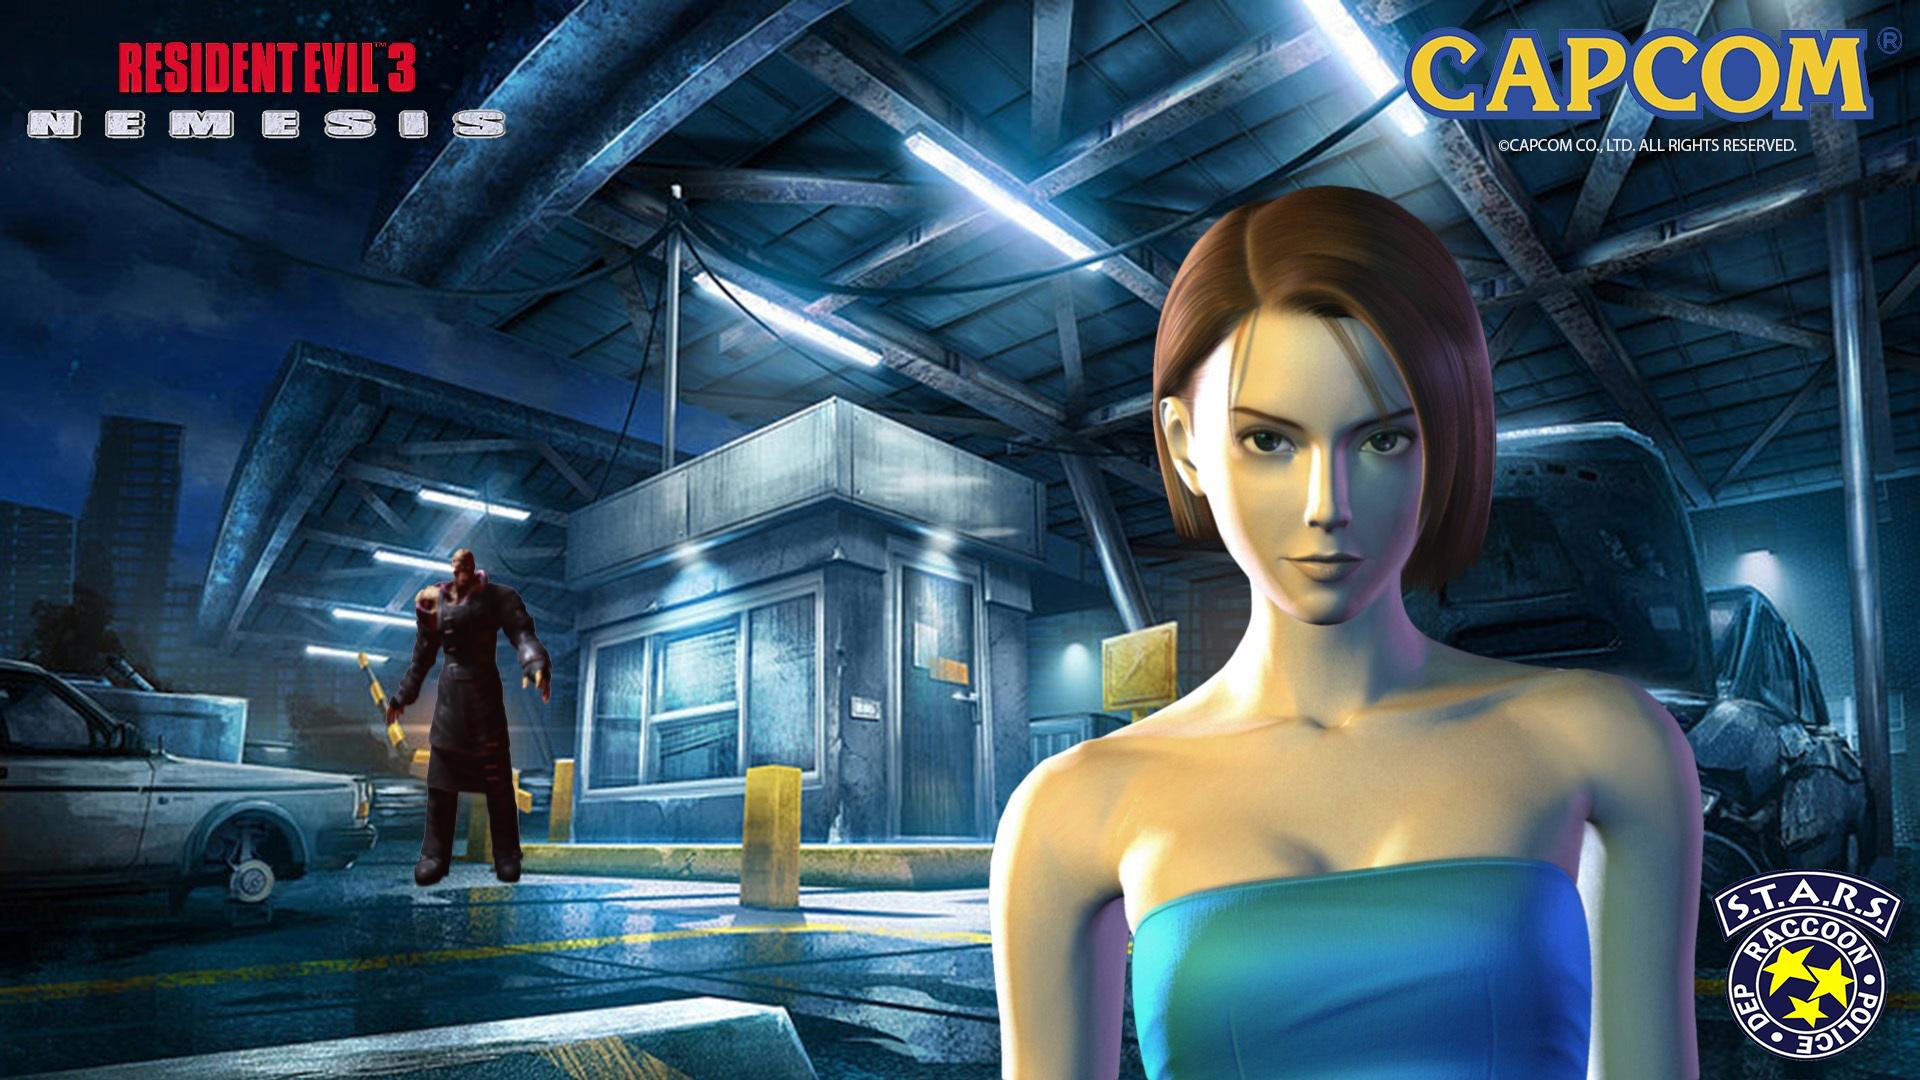 Resident Evil 3 Nemesis HD Wallpaper Background Image 1920x1080